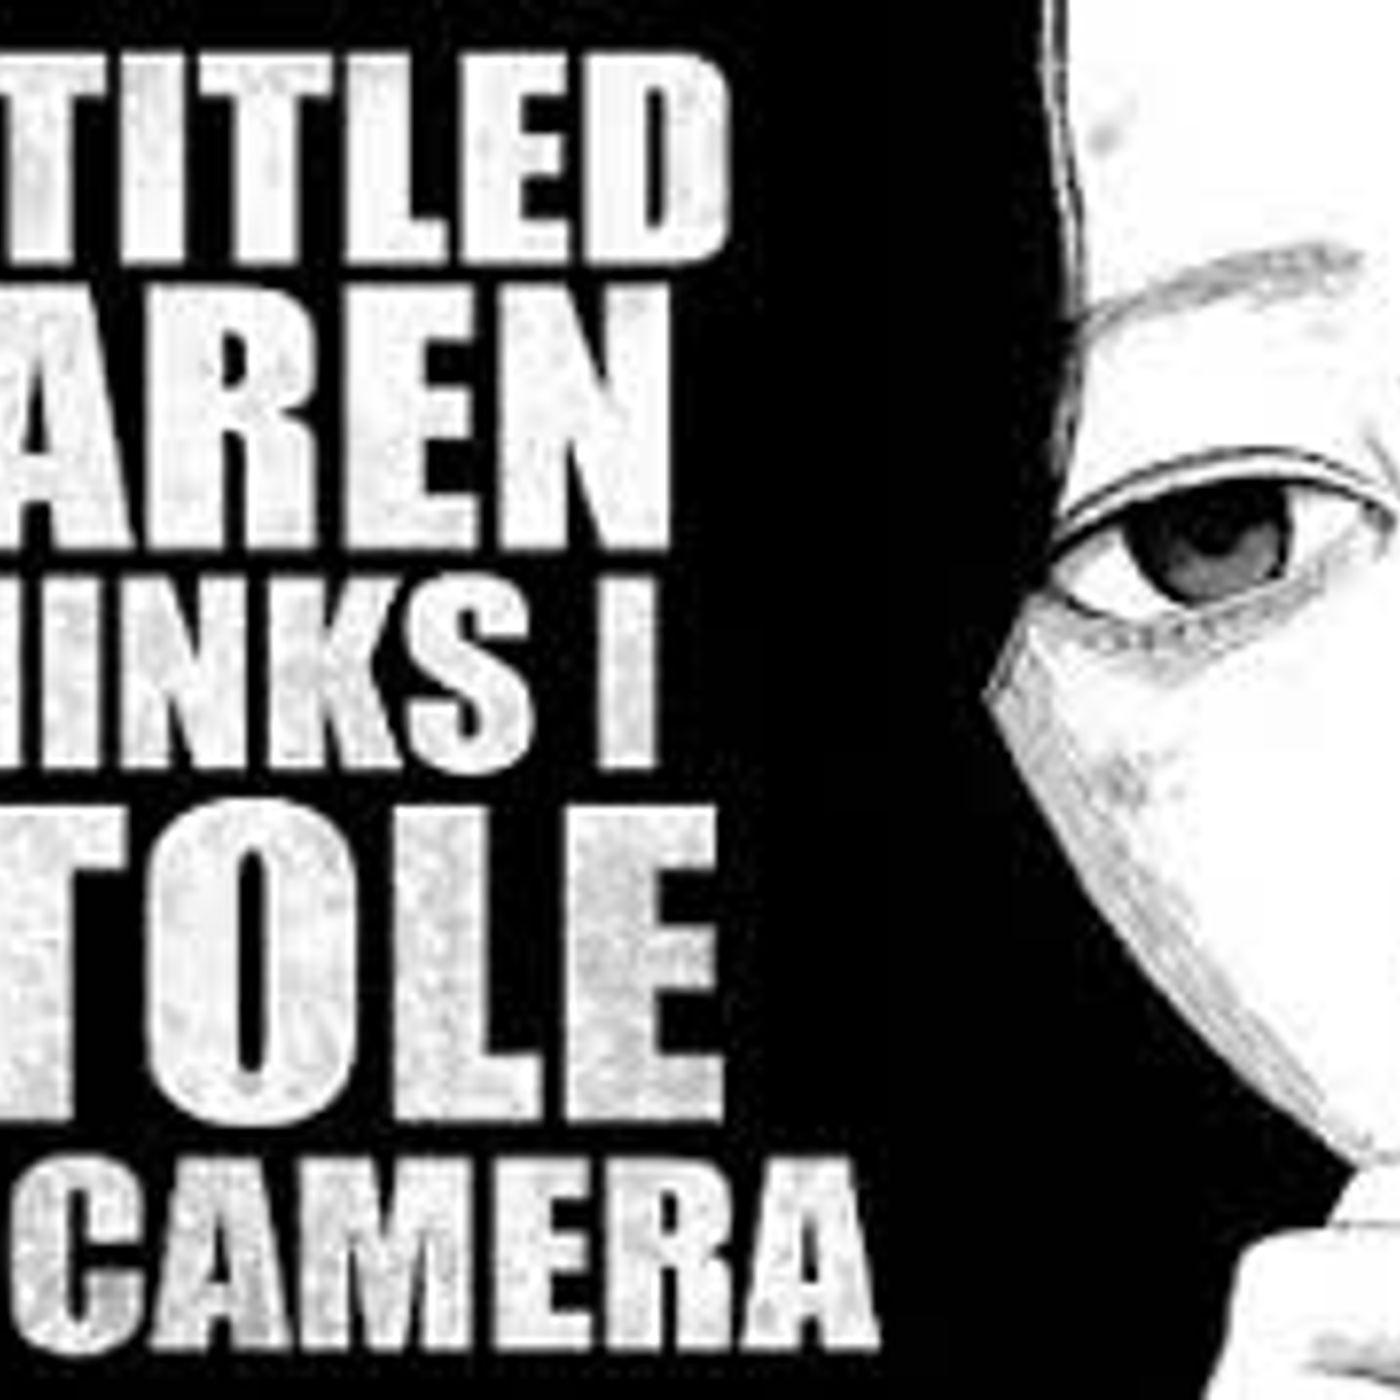 """Entitled Karen Thinks I Stole Her Camera"" Creepypasta"